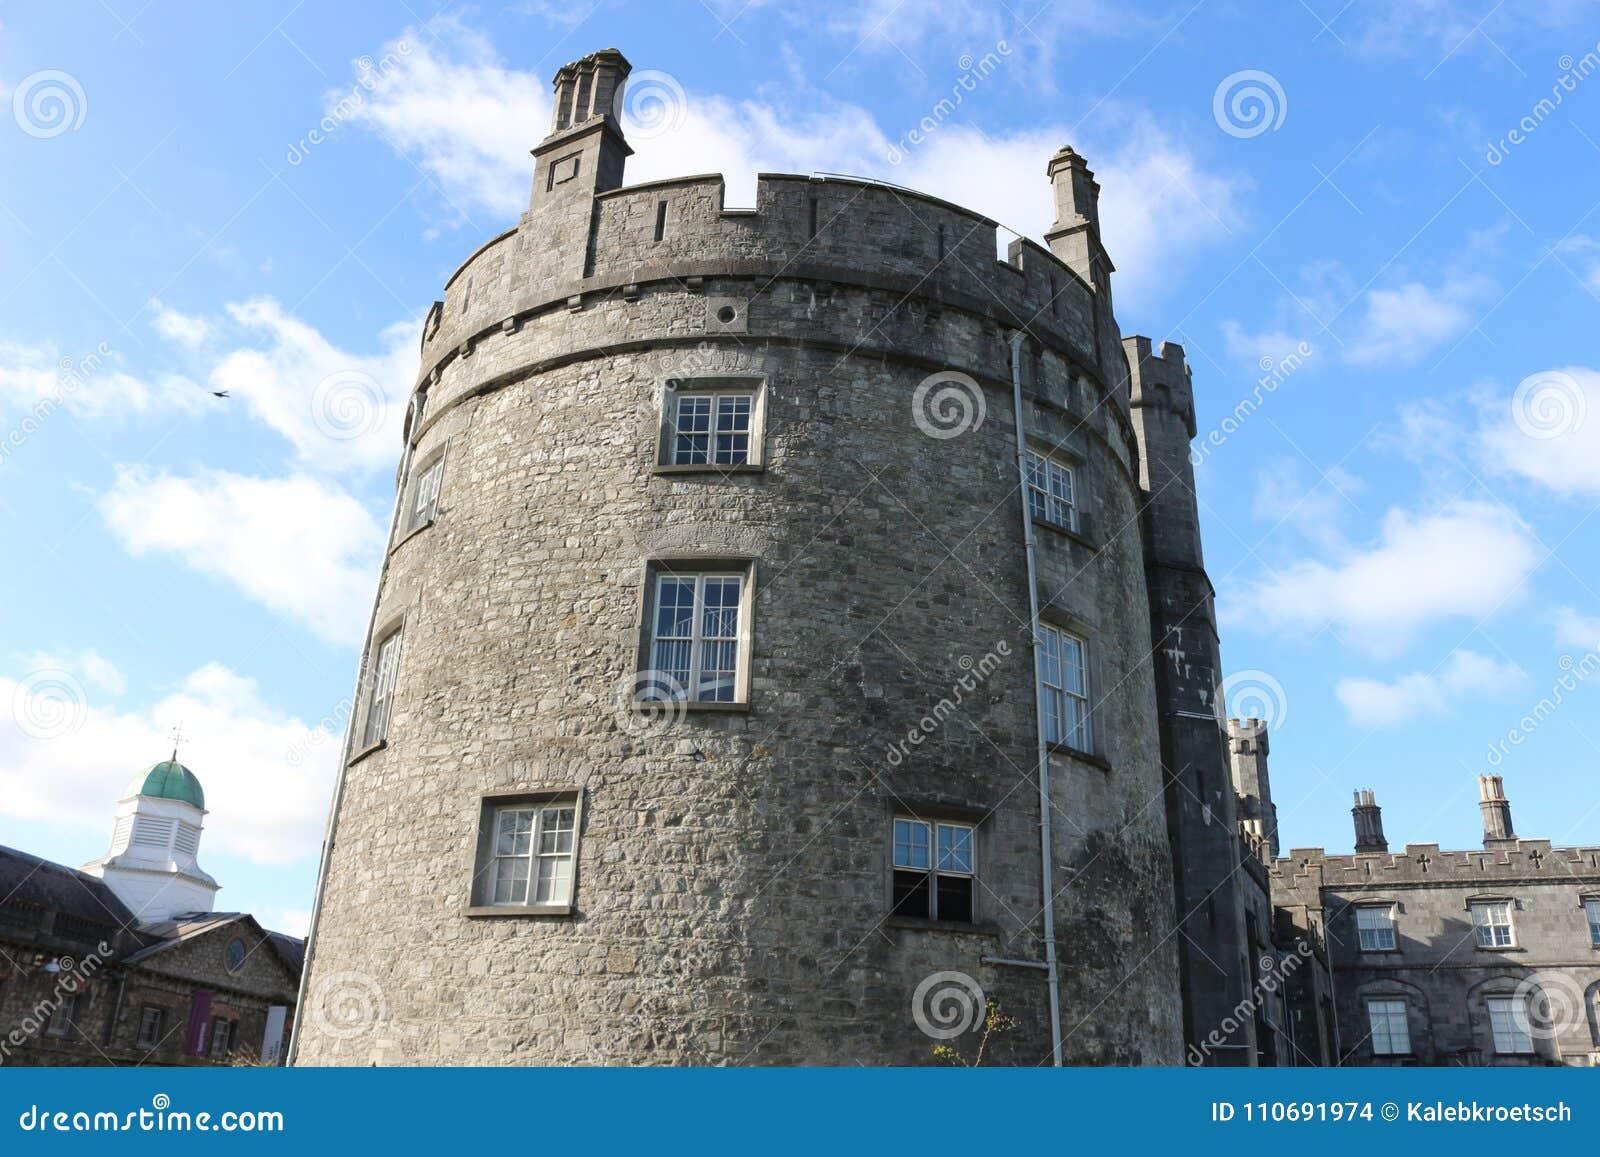 Kilkenny Castle Ιστορικό ορόσημο στην πόλη Kilkenny στην Ιρλανδία